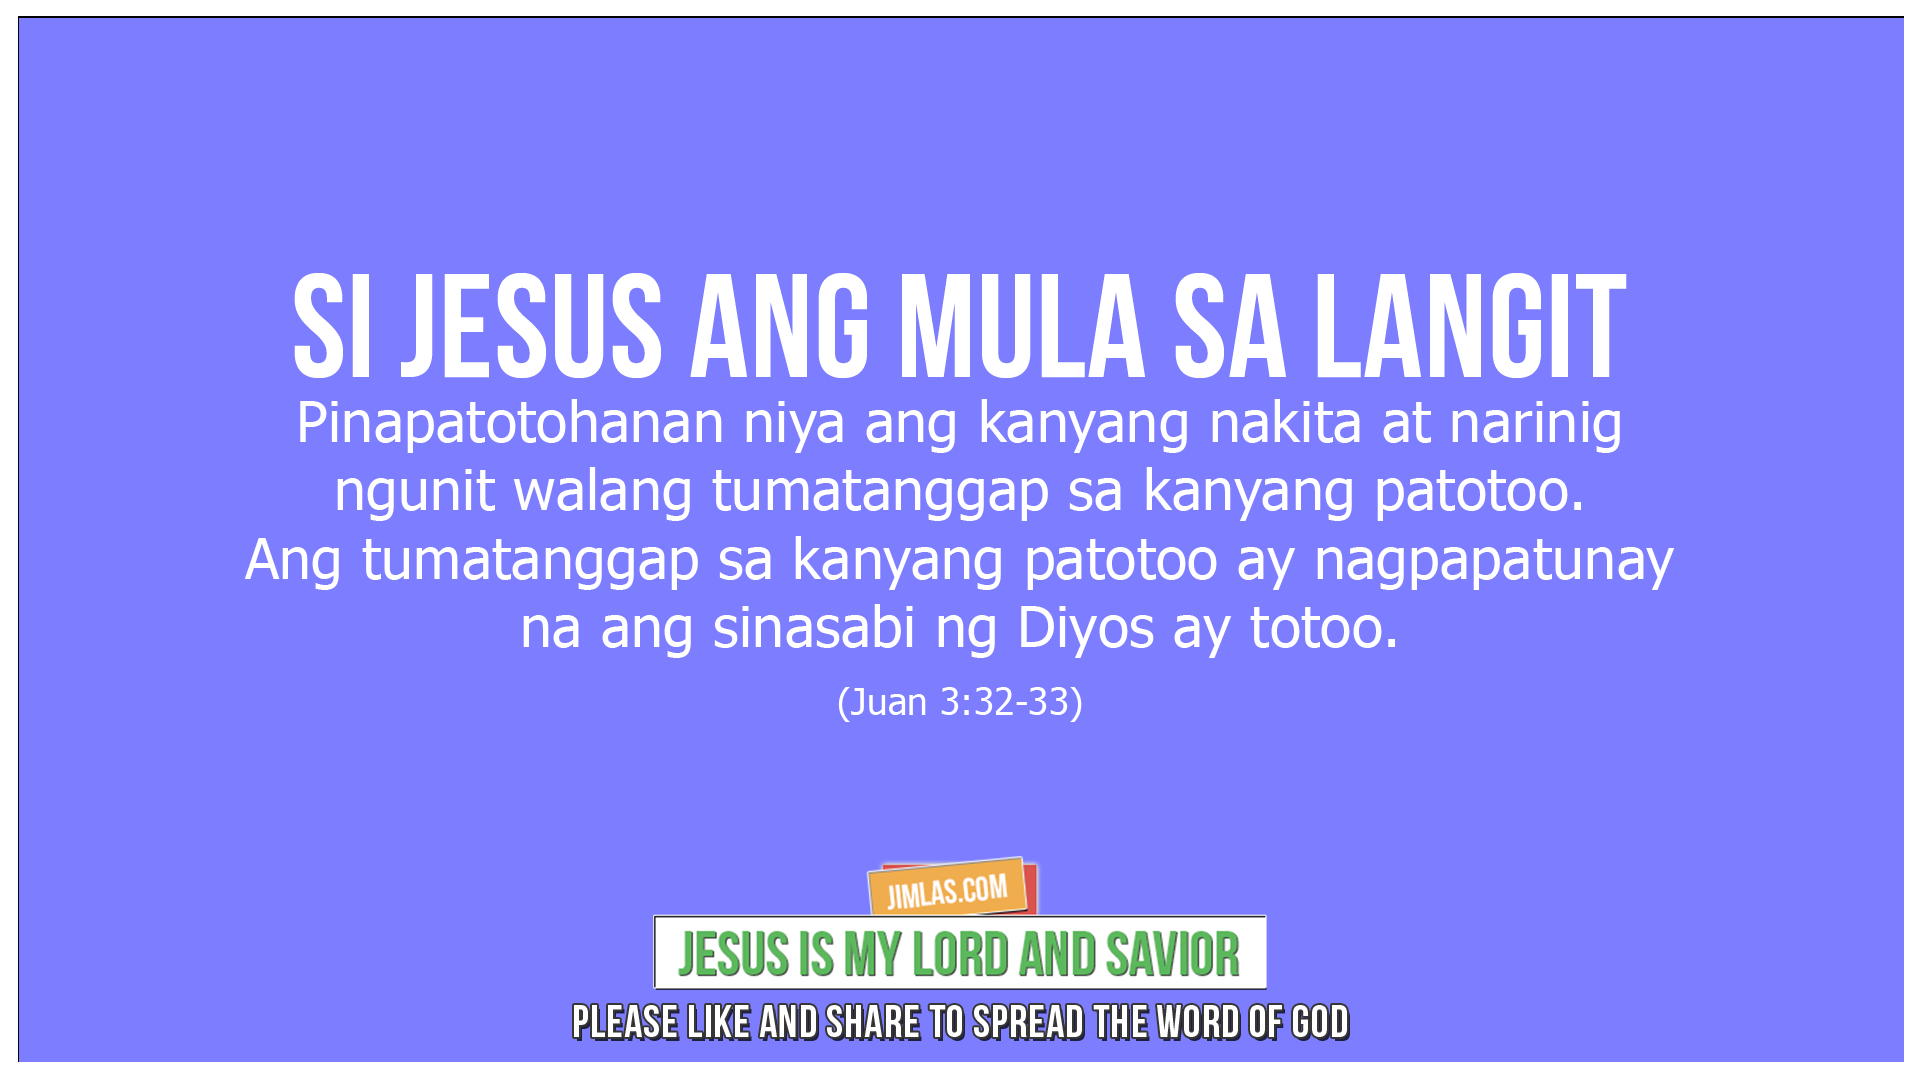 Juan 3 32 33, Juan 3:32-33